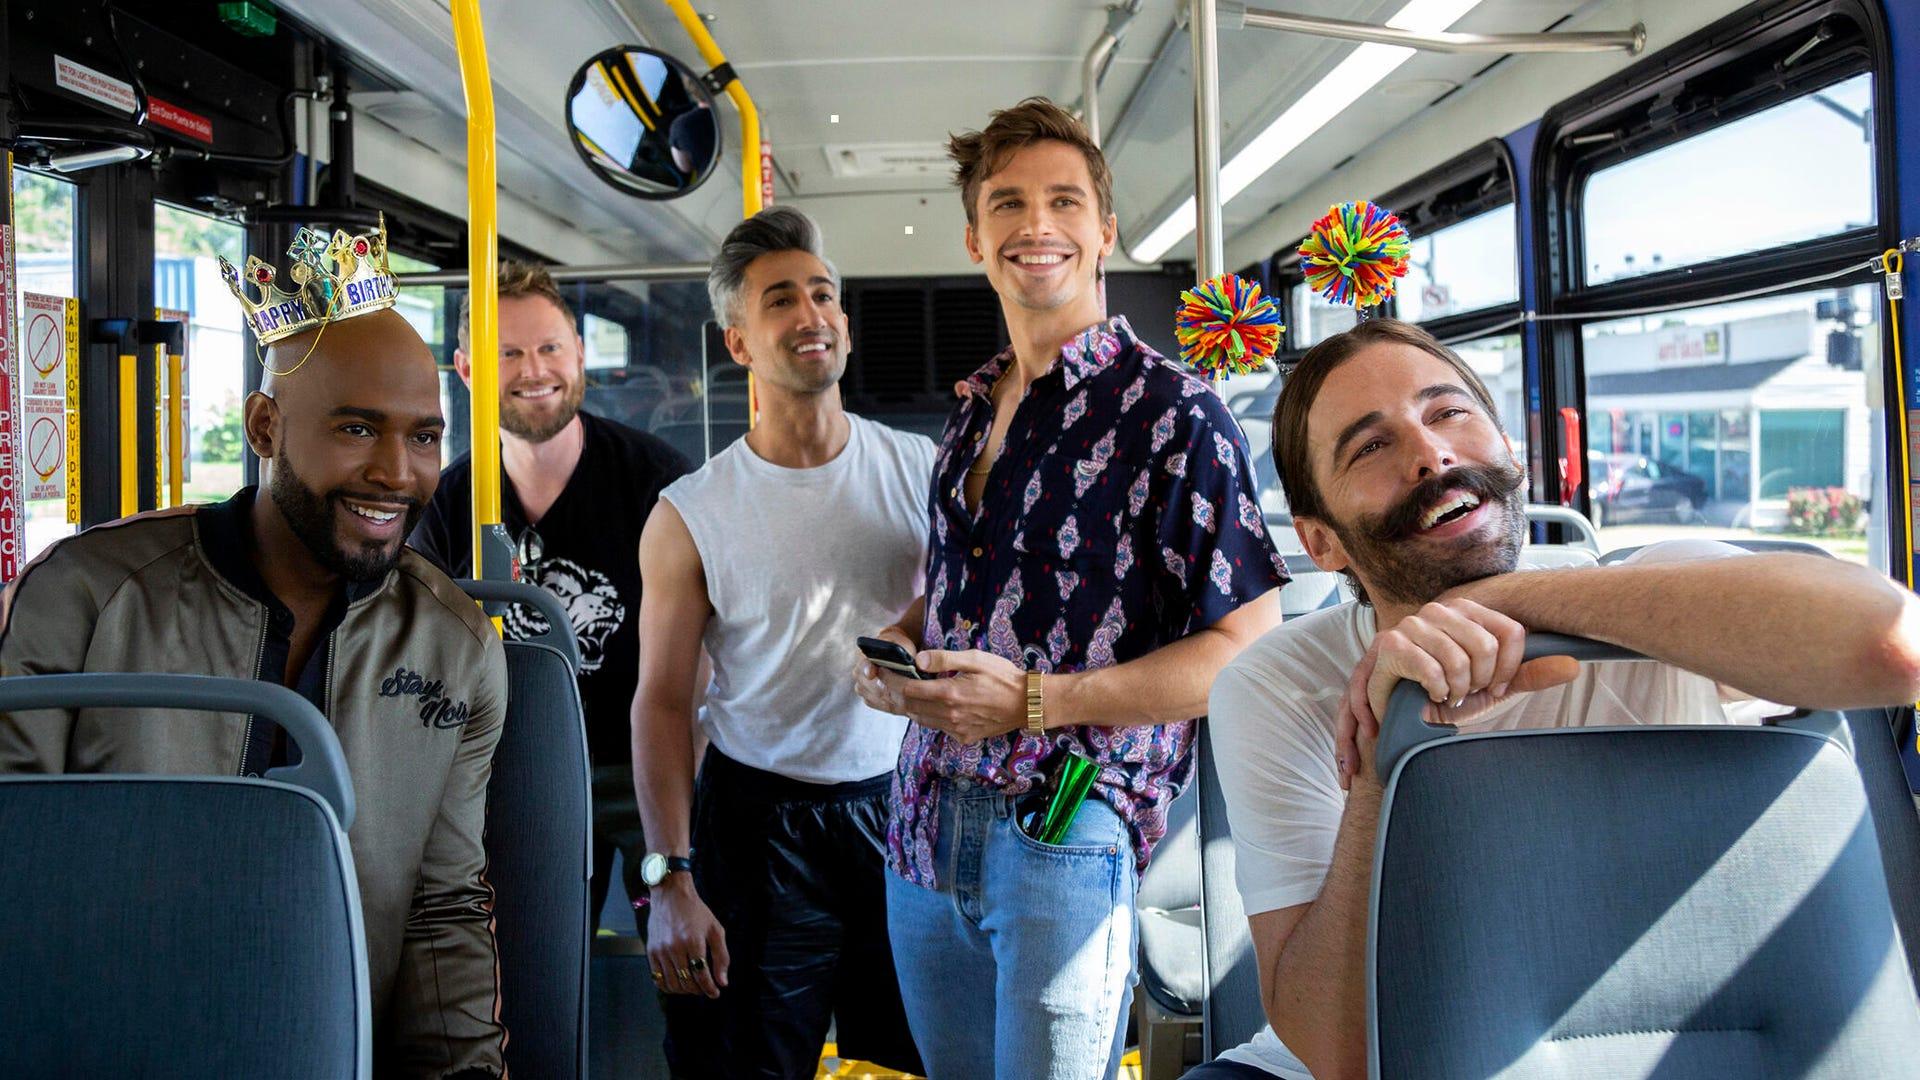 Karamo Brown, Bobby Berk, Tan France, Antoni Porowski, and Jonathan Van Ness, Queer Eye